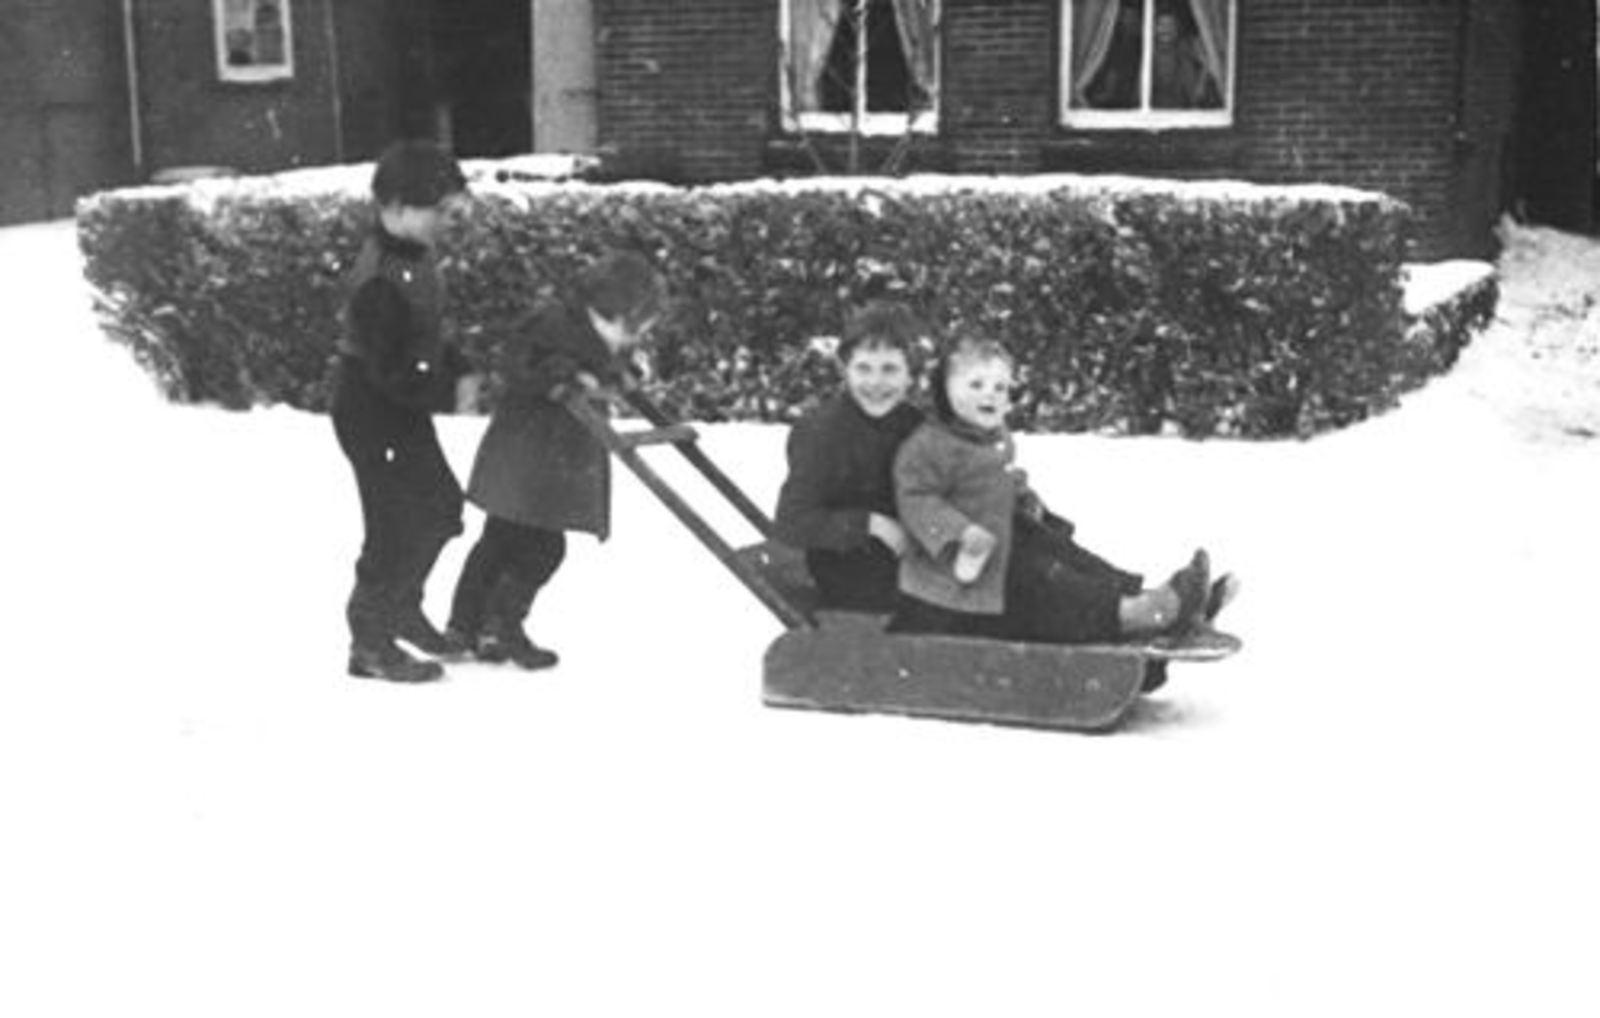 Kruislaan N 0011 1956± met spelende kinderen Mannessen